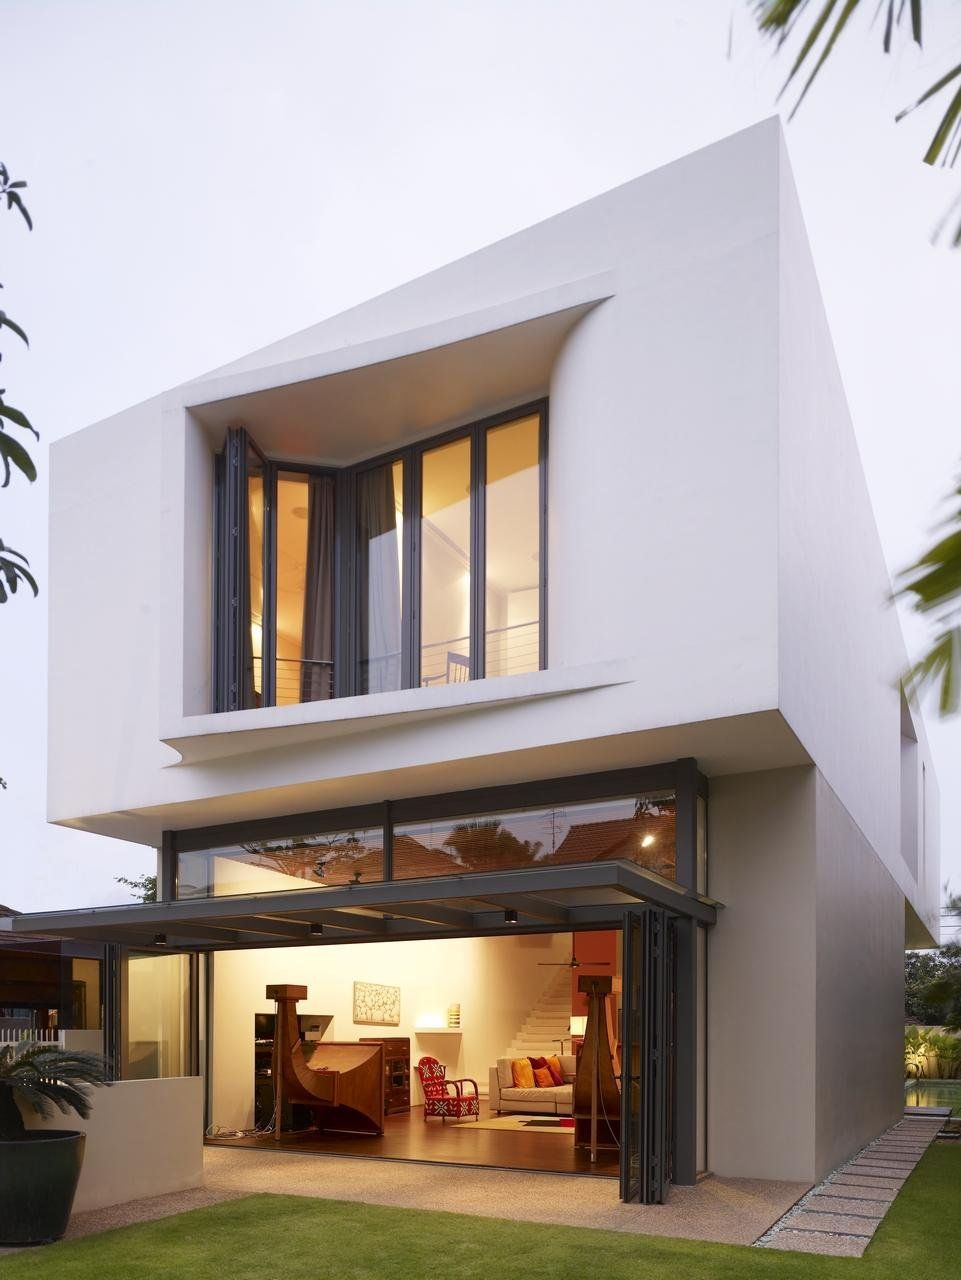 Hy 020213 02 Interior Architecture Design House Design House